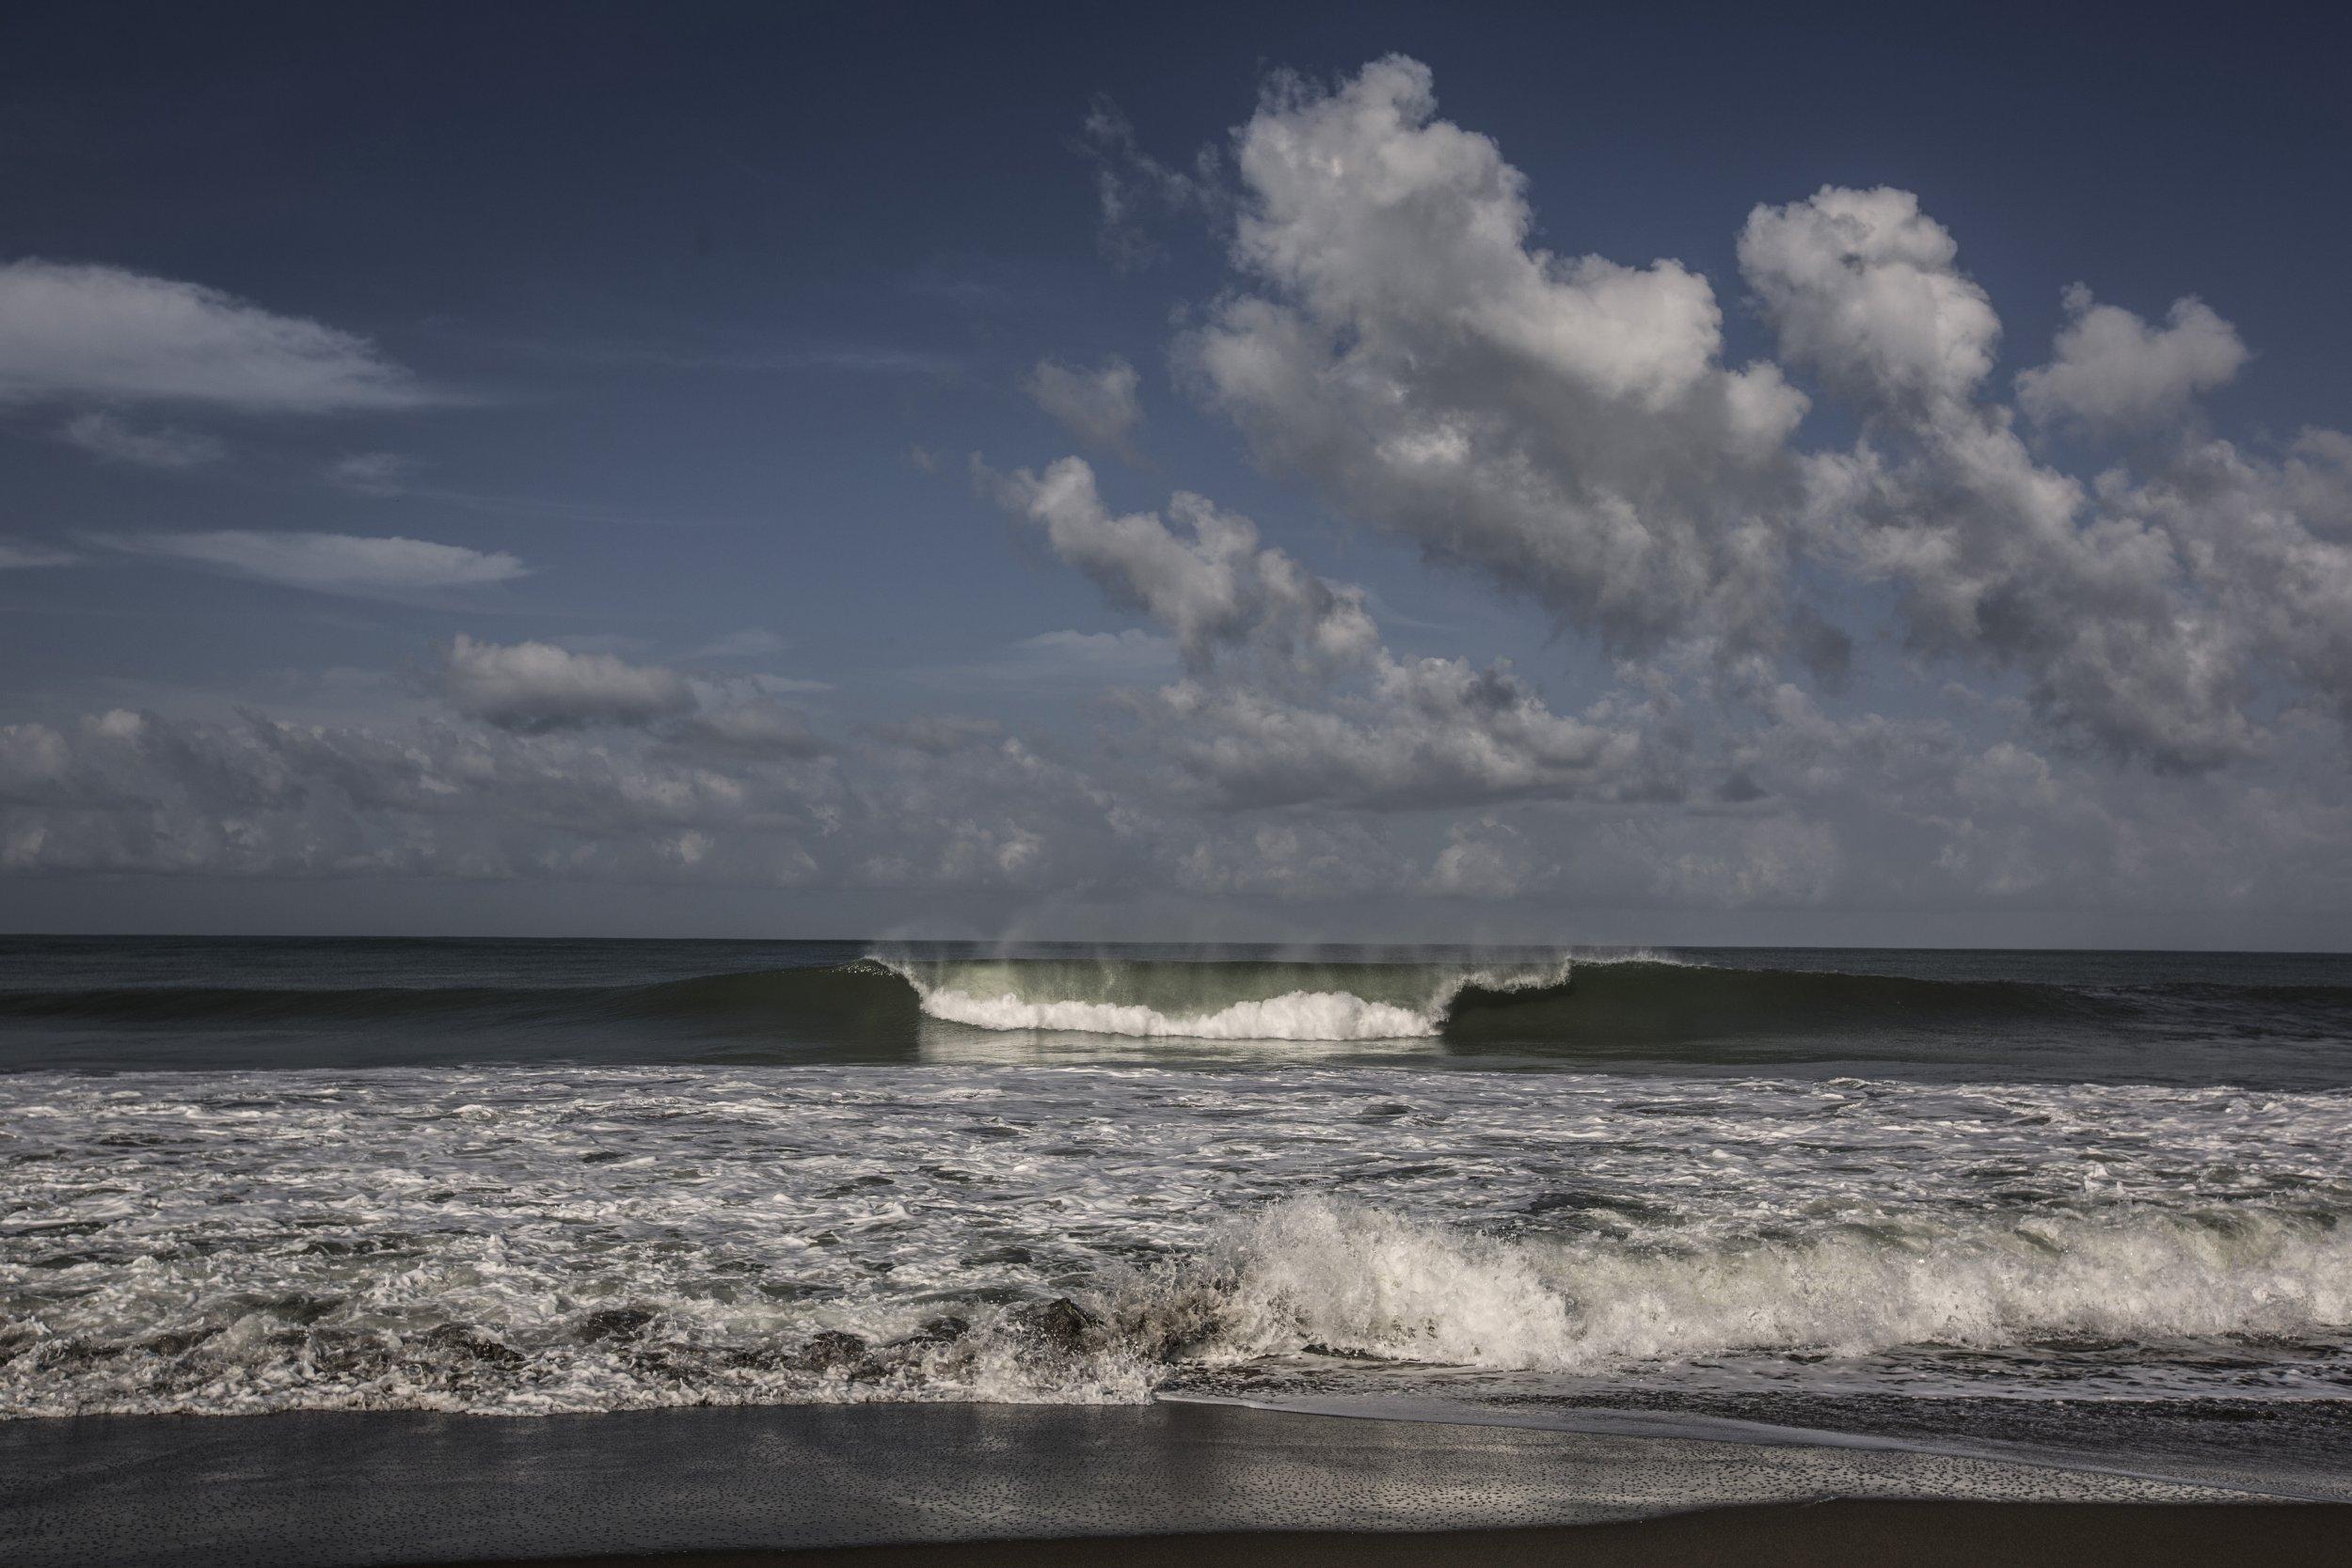 Photos: 10 Years After Indian Ocean Tsunami, the Coast ... Indian Ocean Tsunami Wave